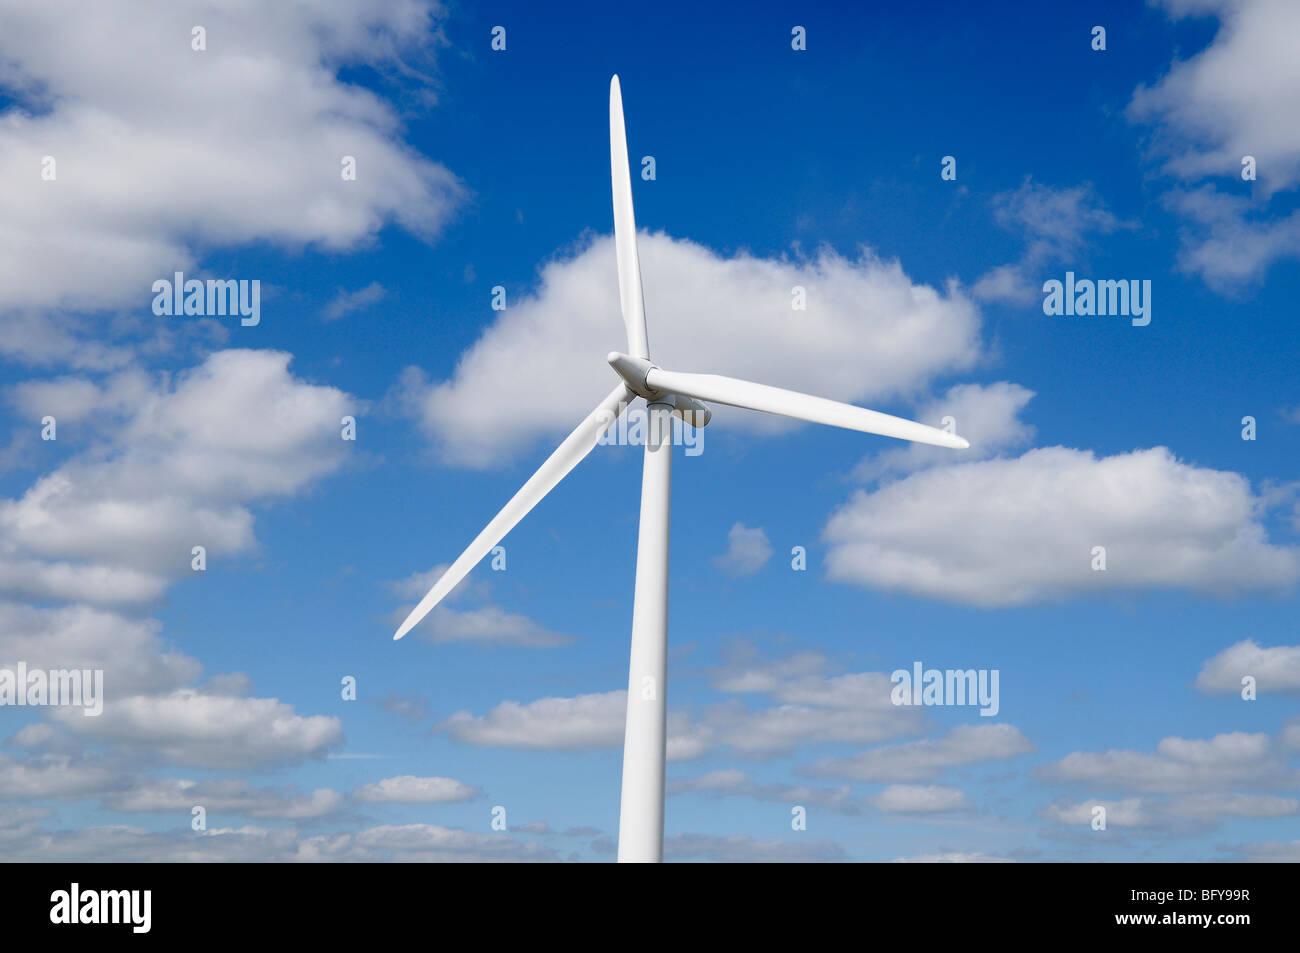 Wind Turbine Against a Cloud Filled Blue Sky - Stock Image